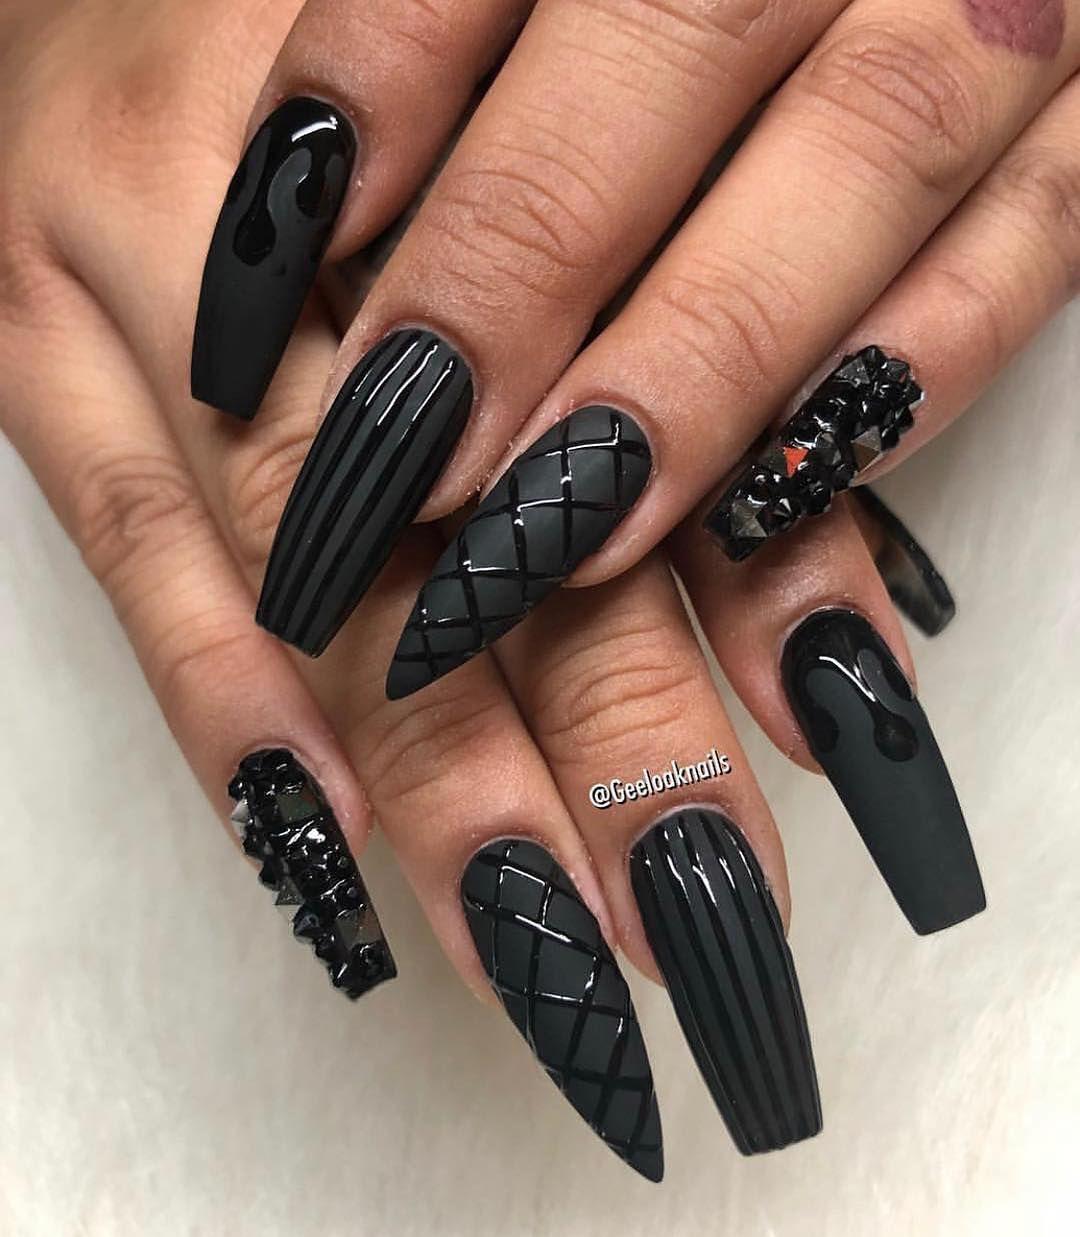 Pinterest Selfcareoverload Black Acrylic Nail Designs Black Nail Designs Matte Black Nails